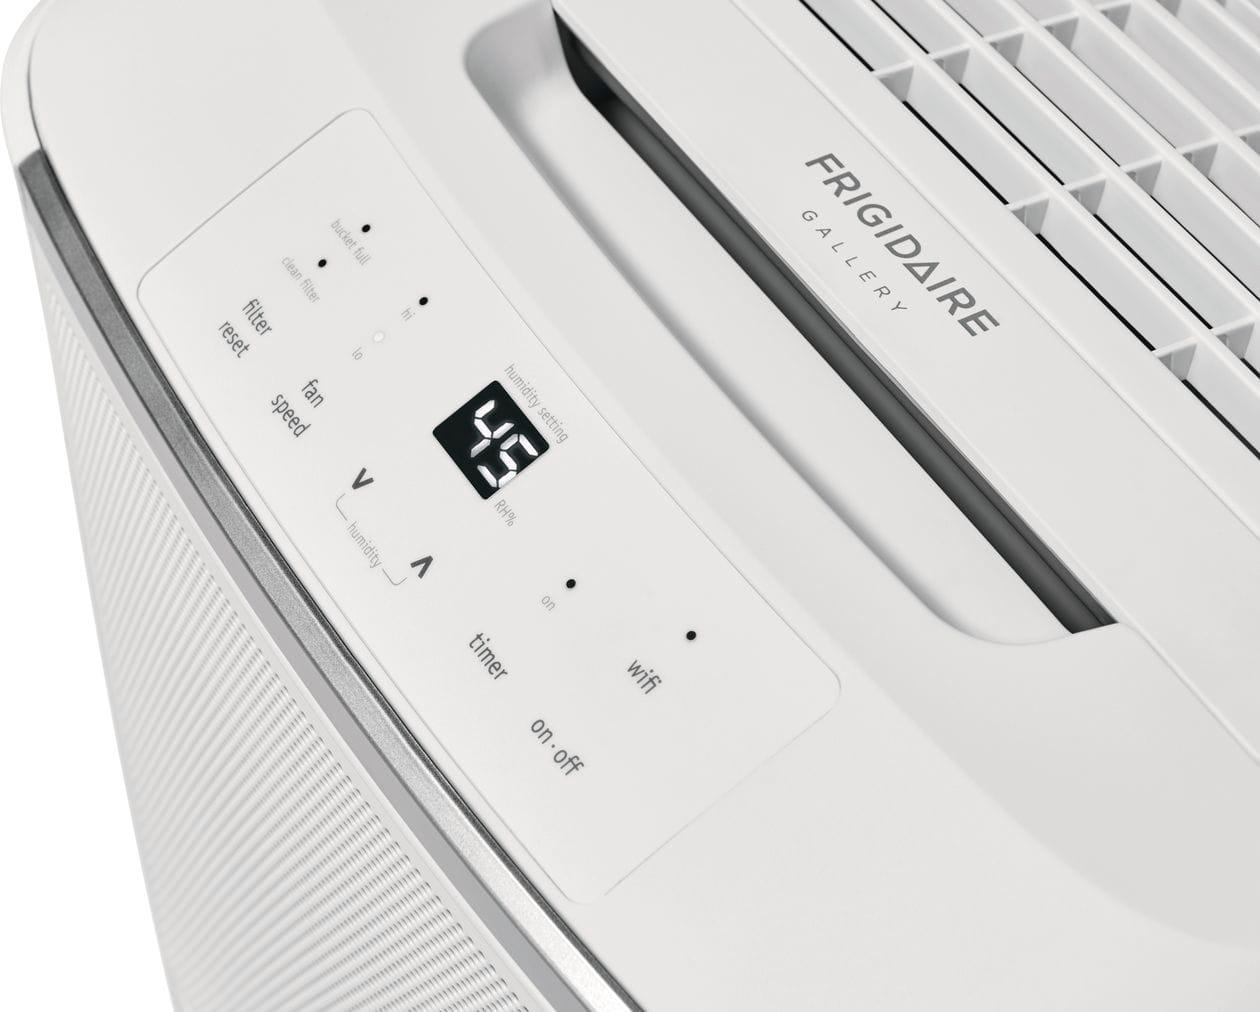 Model: FGAC7044U1   Frigidaire Large Room 70 Pint Capacity Dehumidifier with Wifi